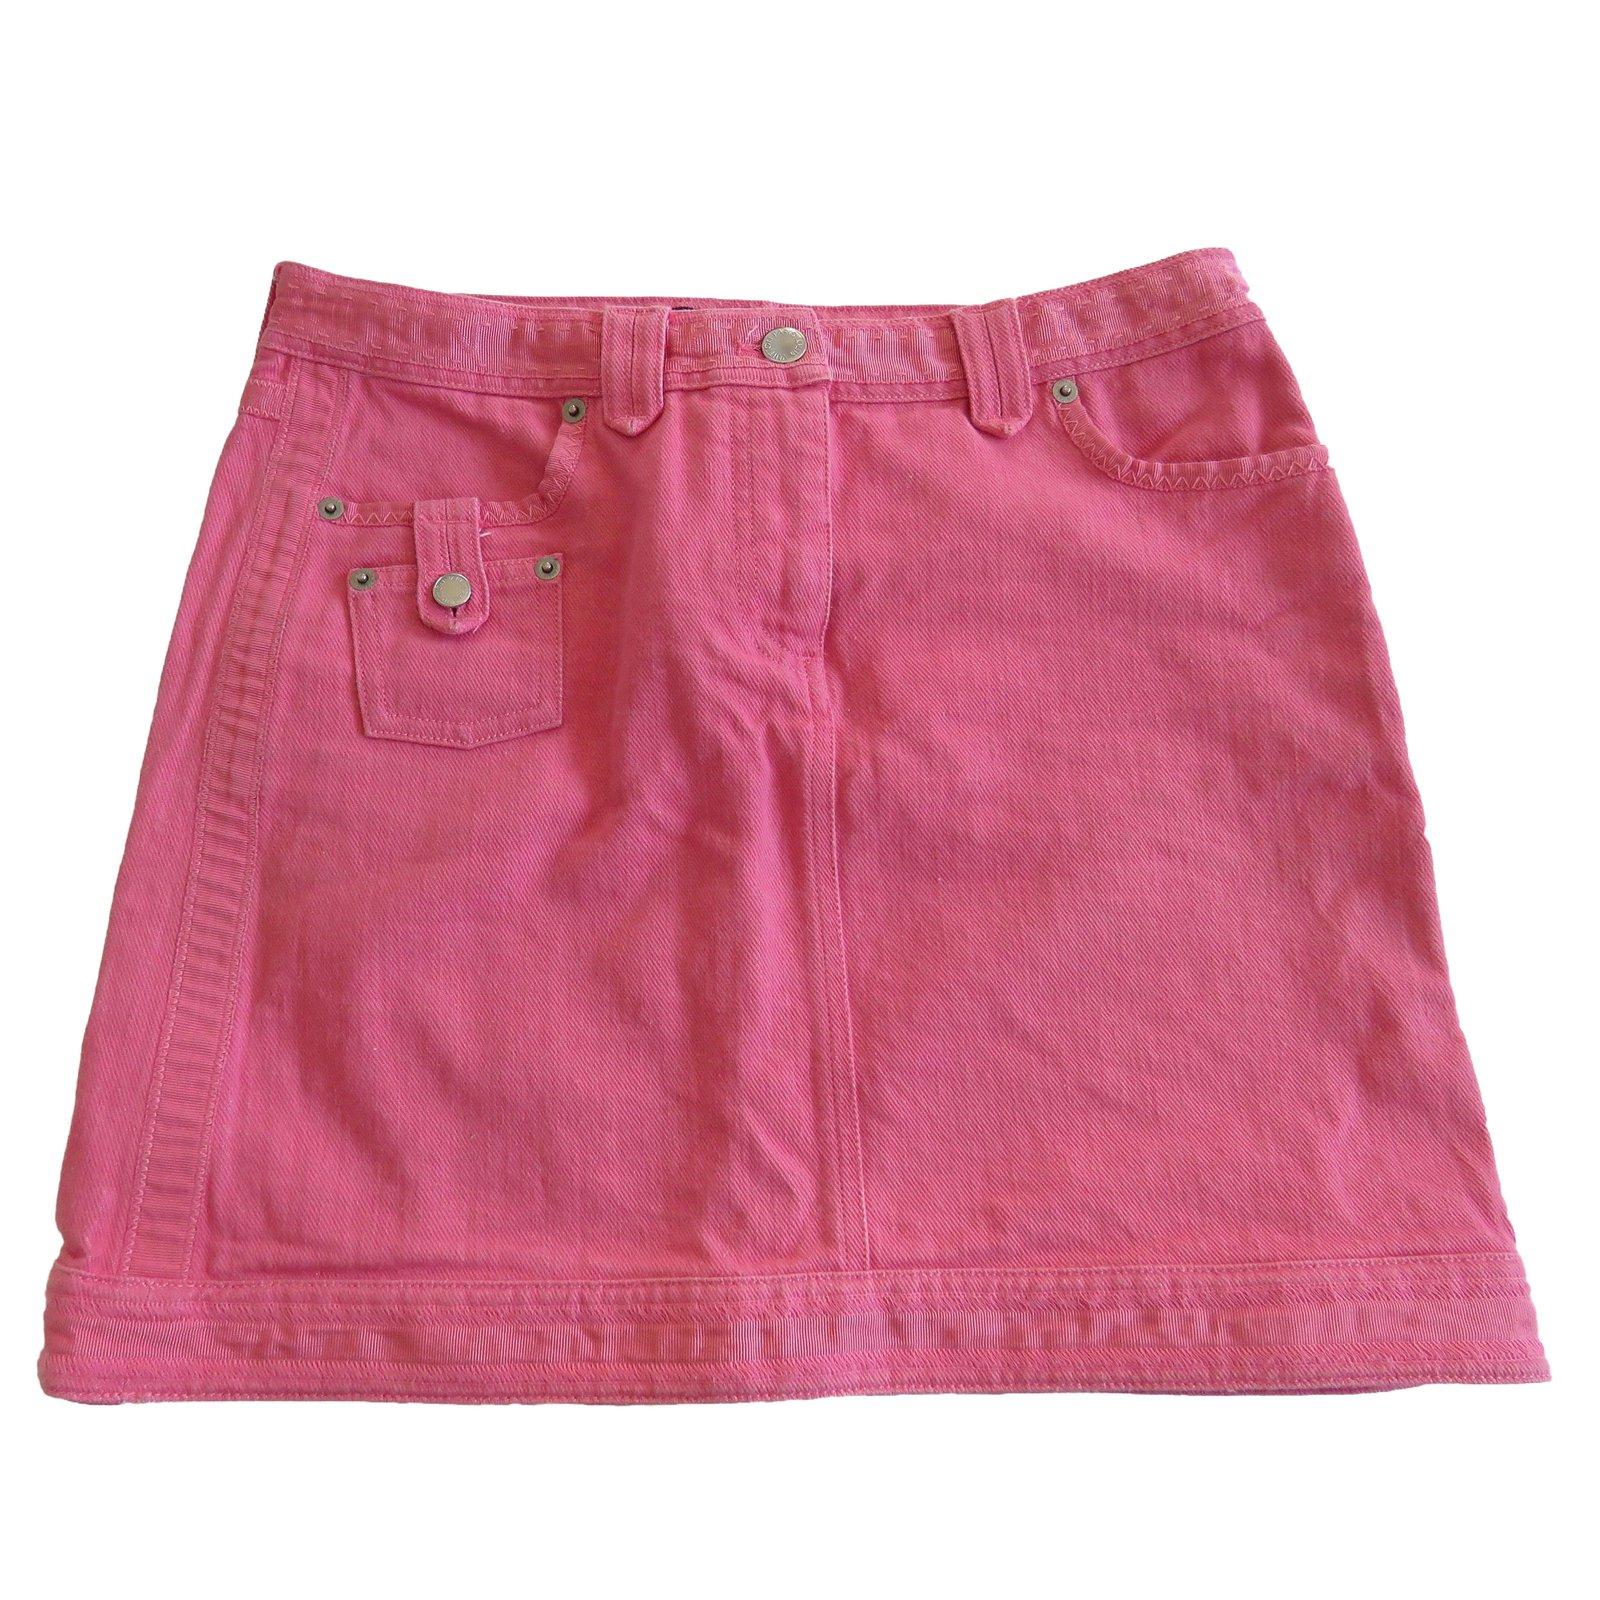 jupes louis vuitton mini jupe coton rose joli. Black Bedroom Furniture Sets. Home Design Ideas